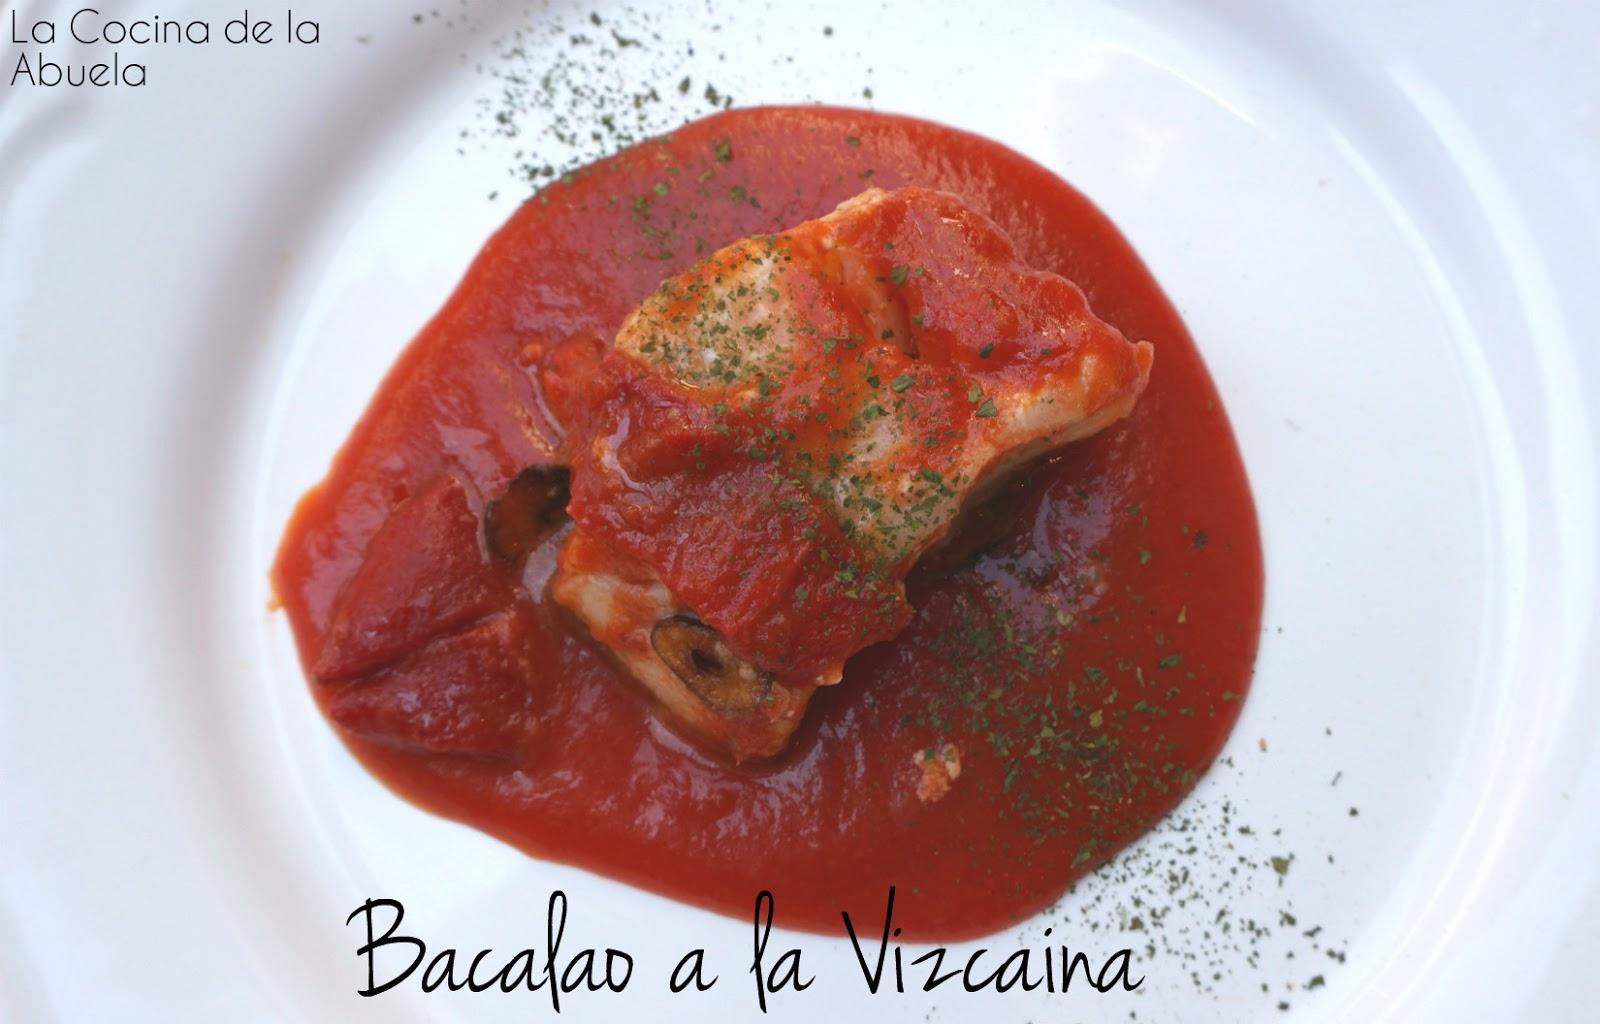 Bacalao a la riojana con bacalao fresco la cocina de la - Bacalao fresco con tomate ...